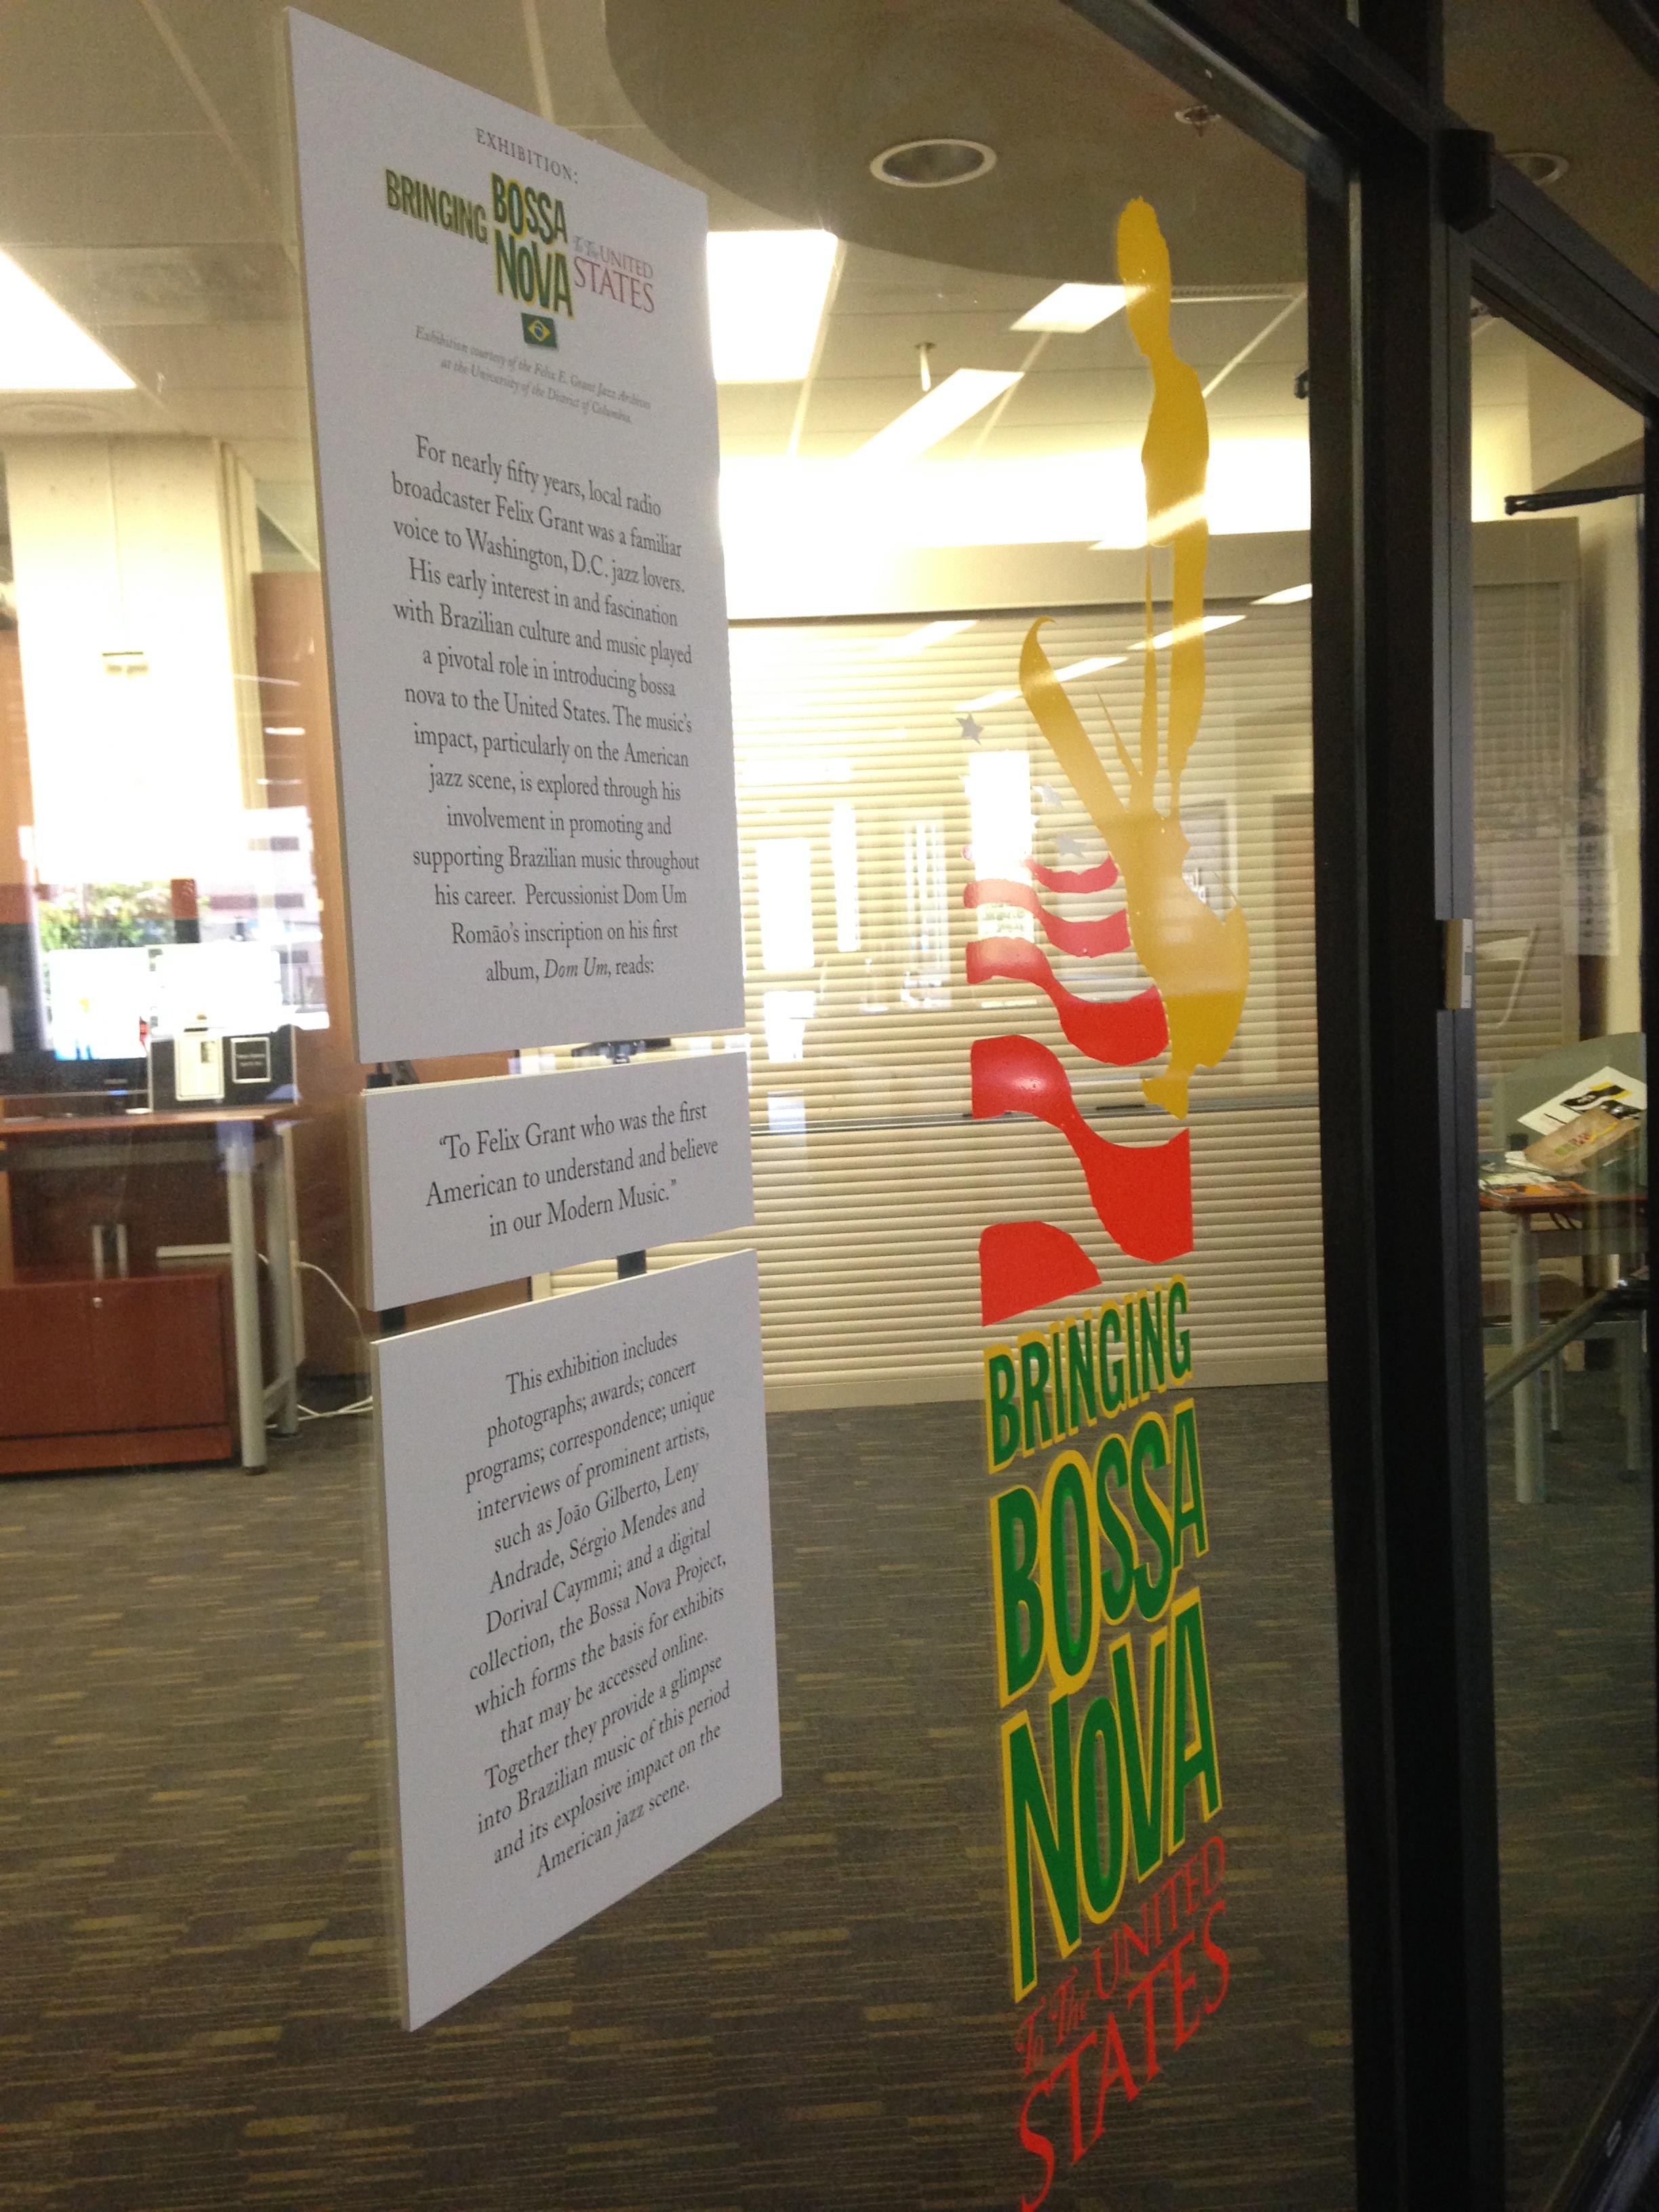 Exhibit: Bringing Bossa Nova to the United States